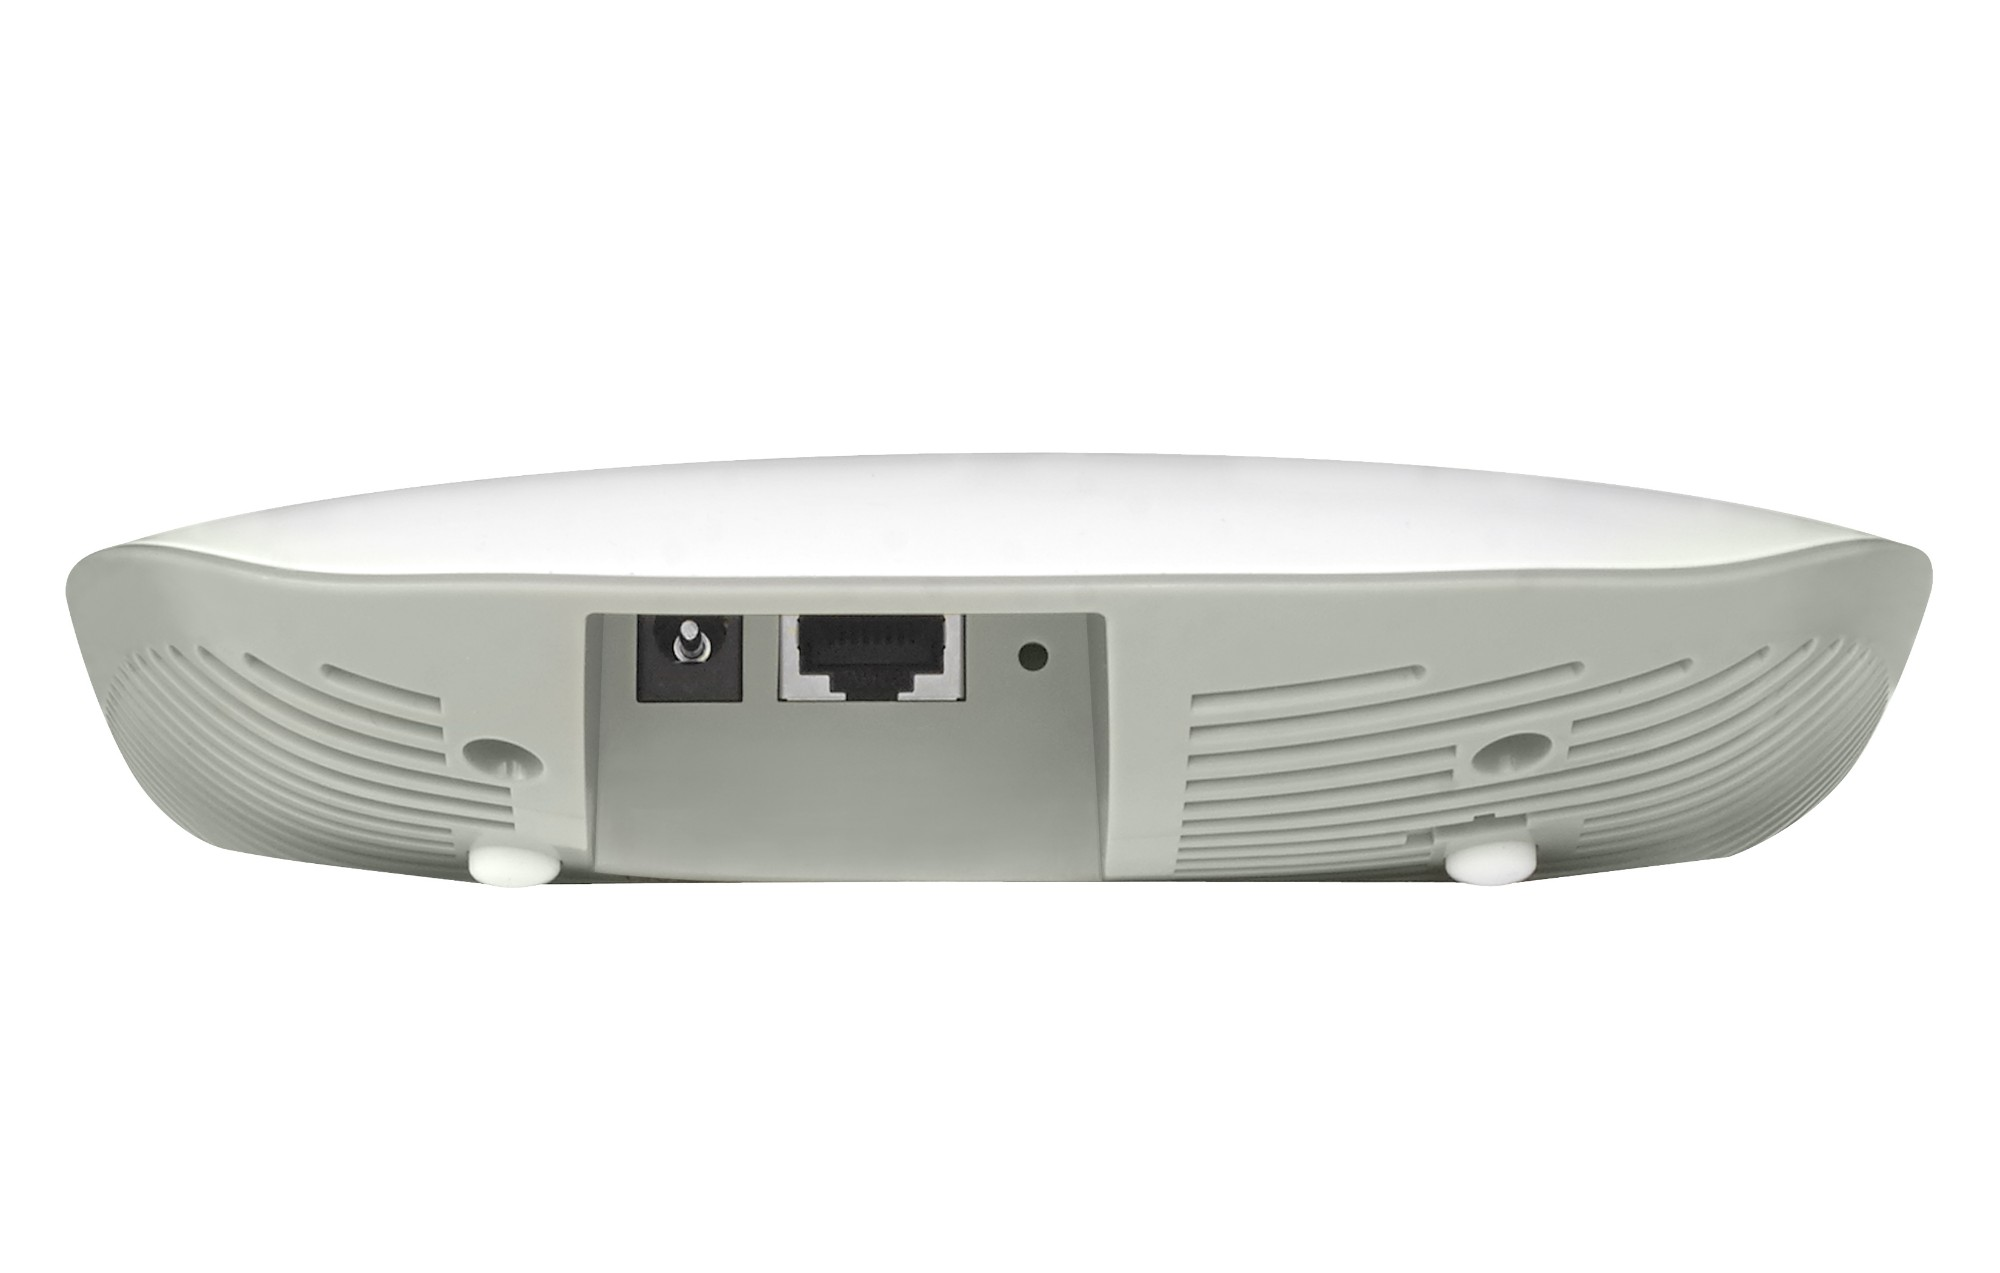 Netgear WAC505 1200Mbit/s Power over Ethernet (PoE) White WLAN ...